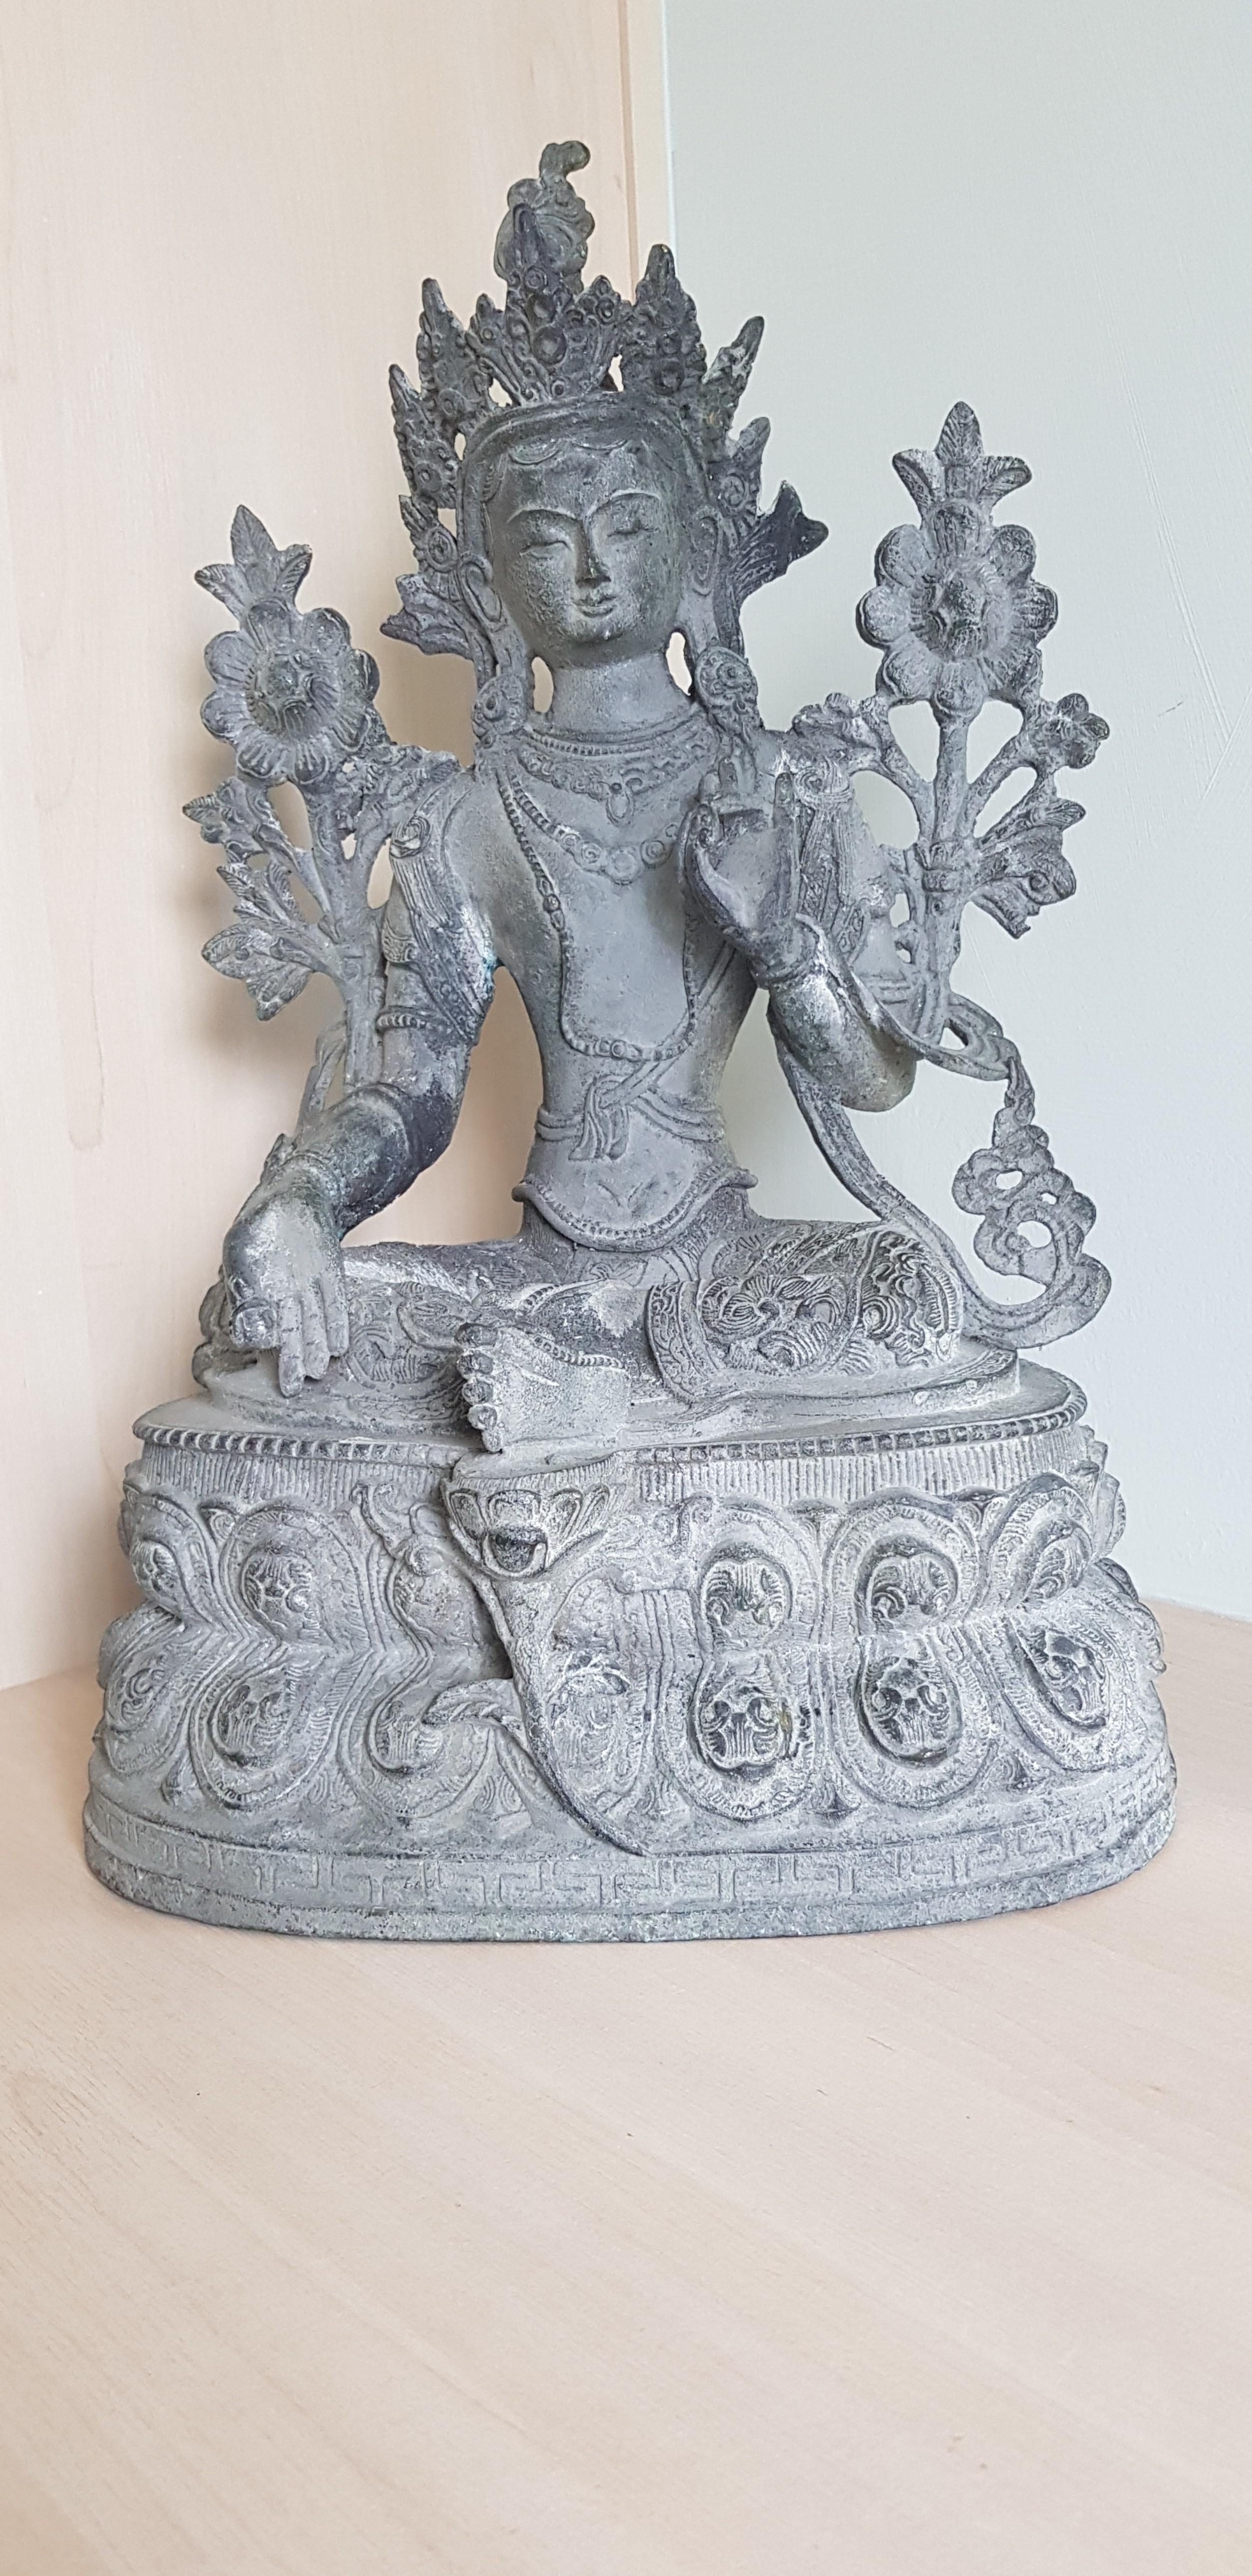 superb large bronze figure of a buddha